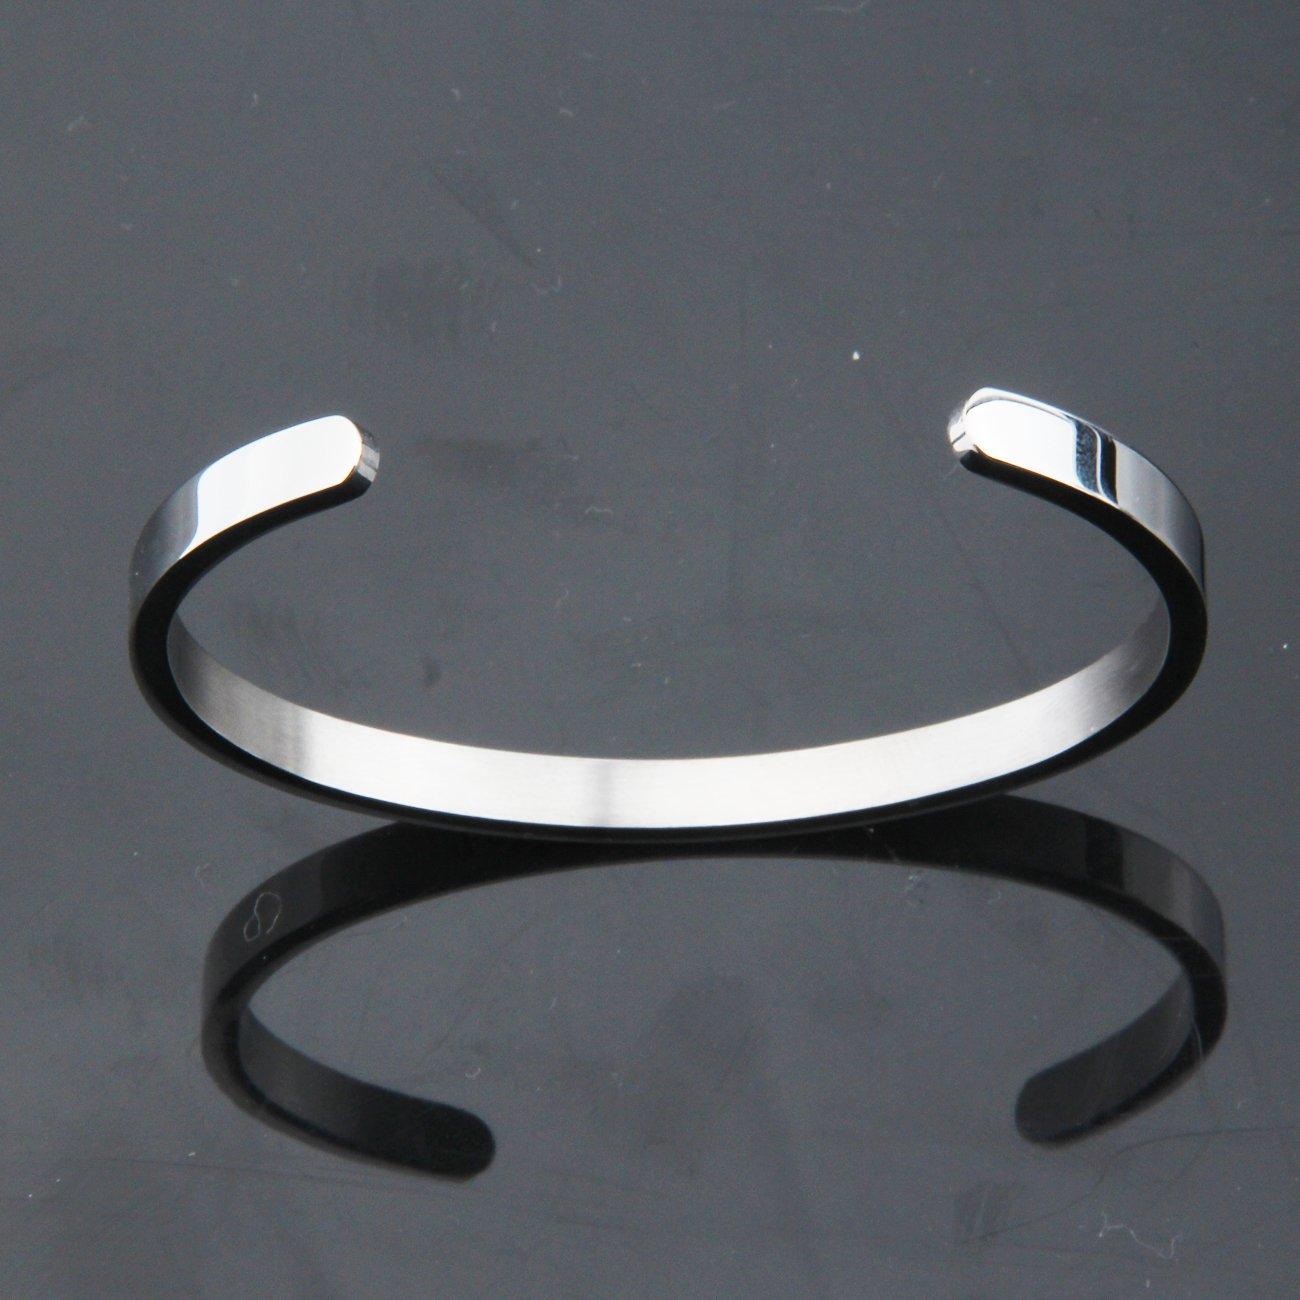 Lywjyb Birdgot Religious Bracelet Faith Bracelet Faith Hope Love Inspirational Jewelry for Girls Sister Wife